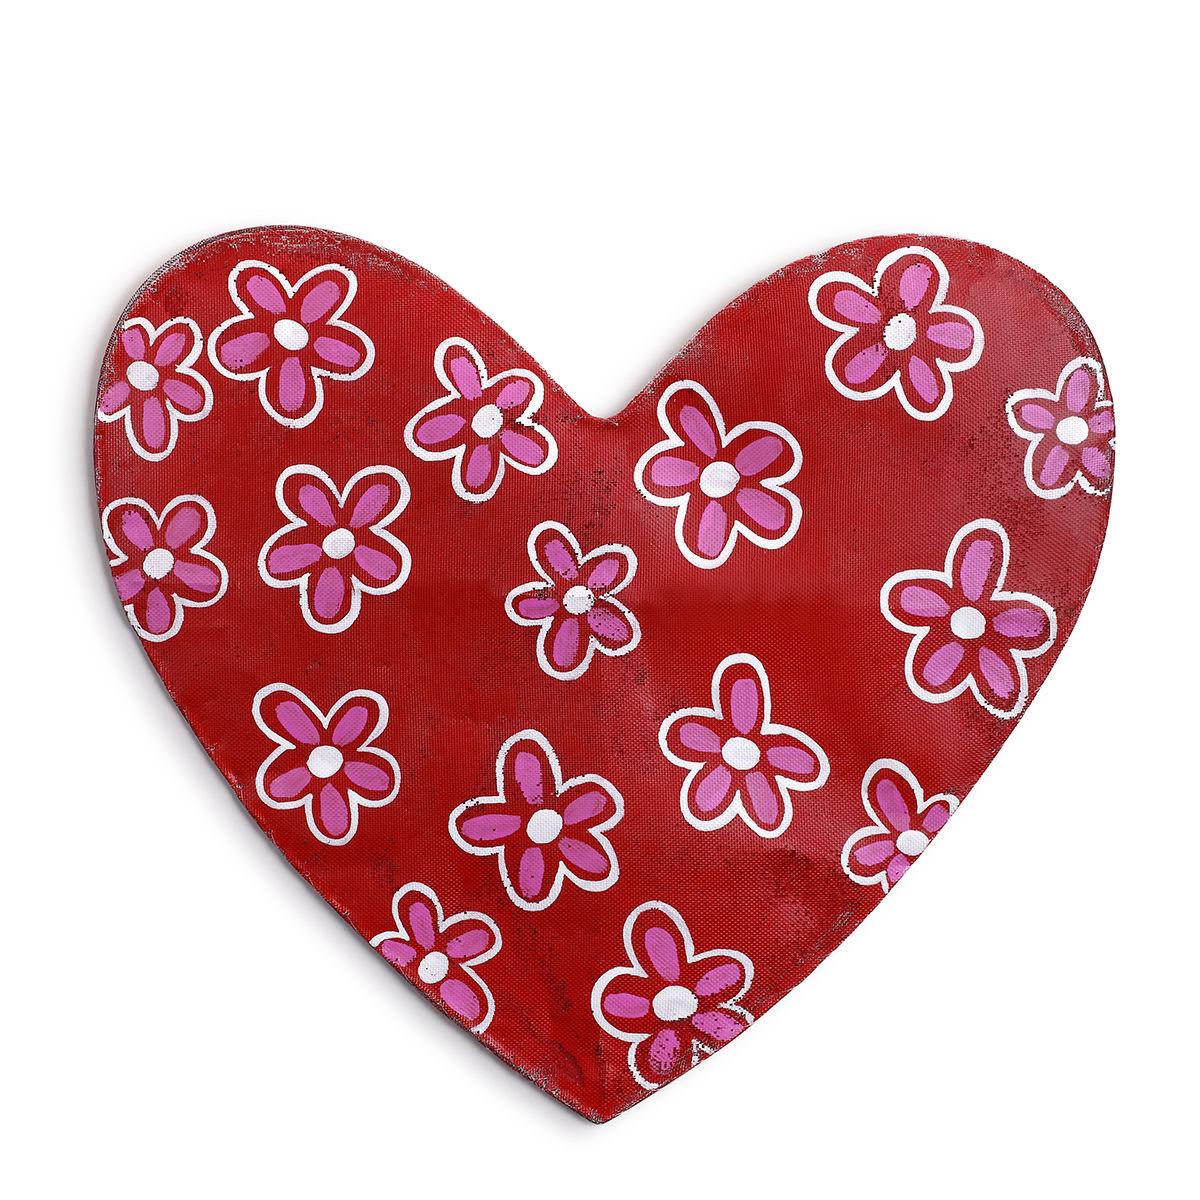 Seasonal Screenings Whimsy Hearts with Flower